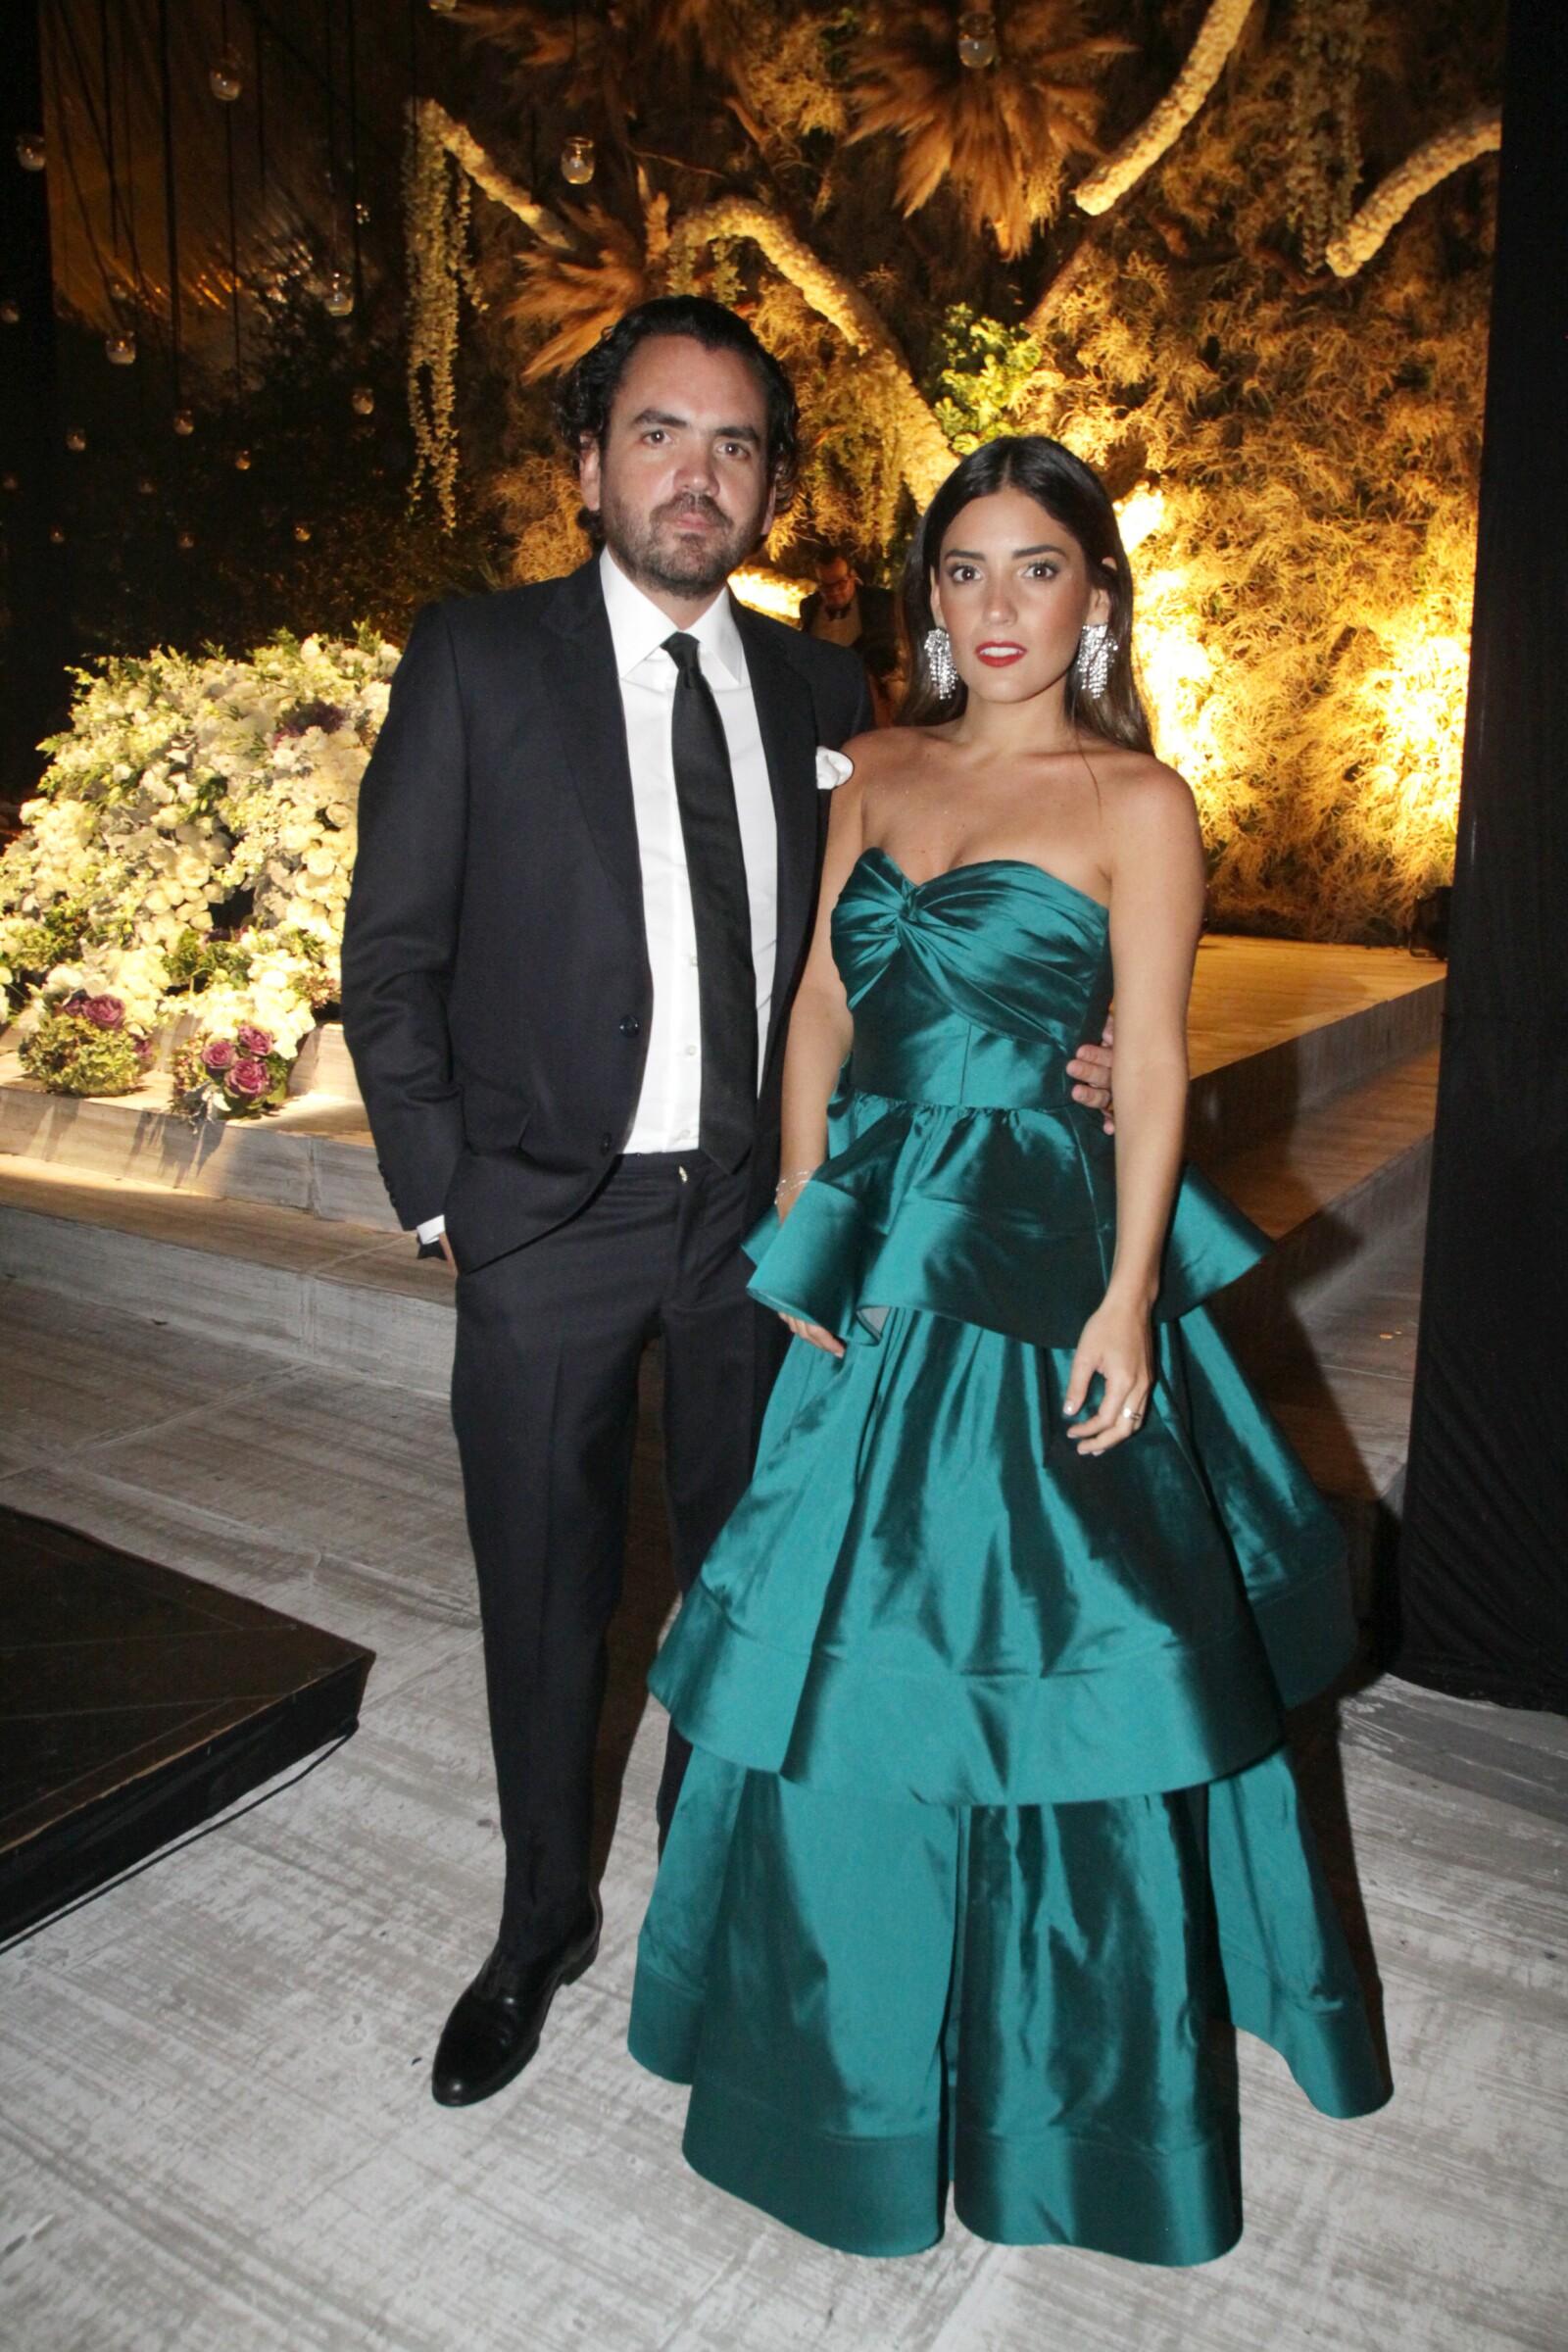 Fernanda Moyano y Francisco Lebrija.JPG